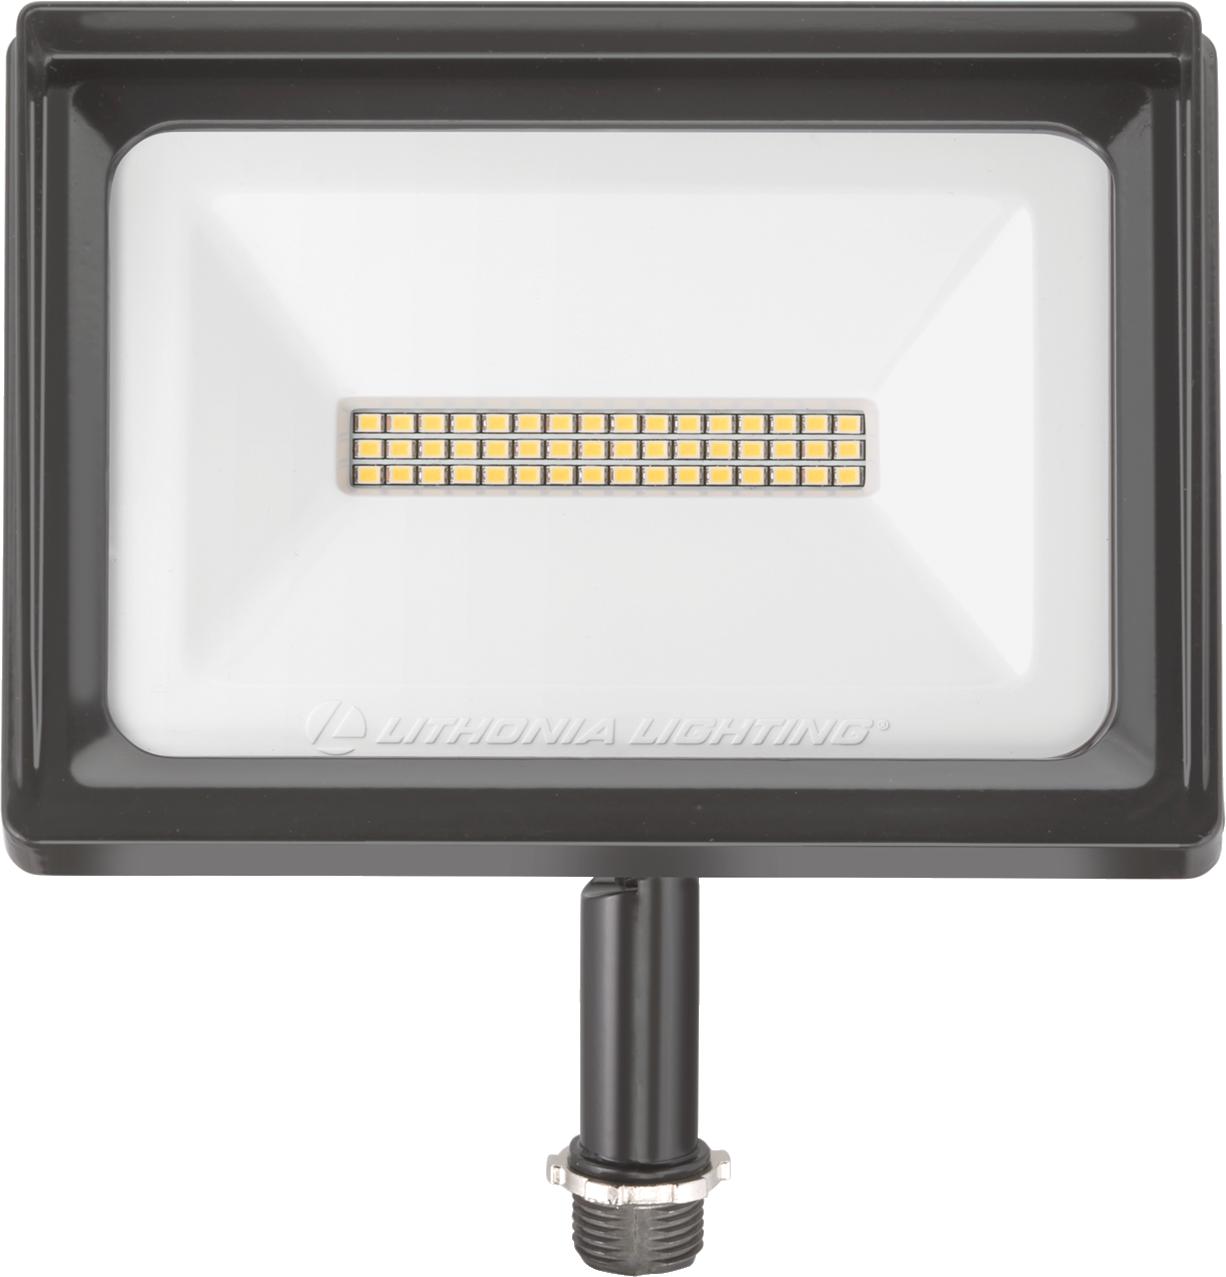 QTE LED P1 40K THK DDB_004.png